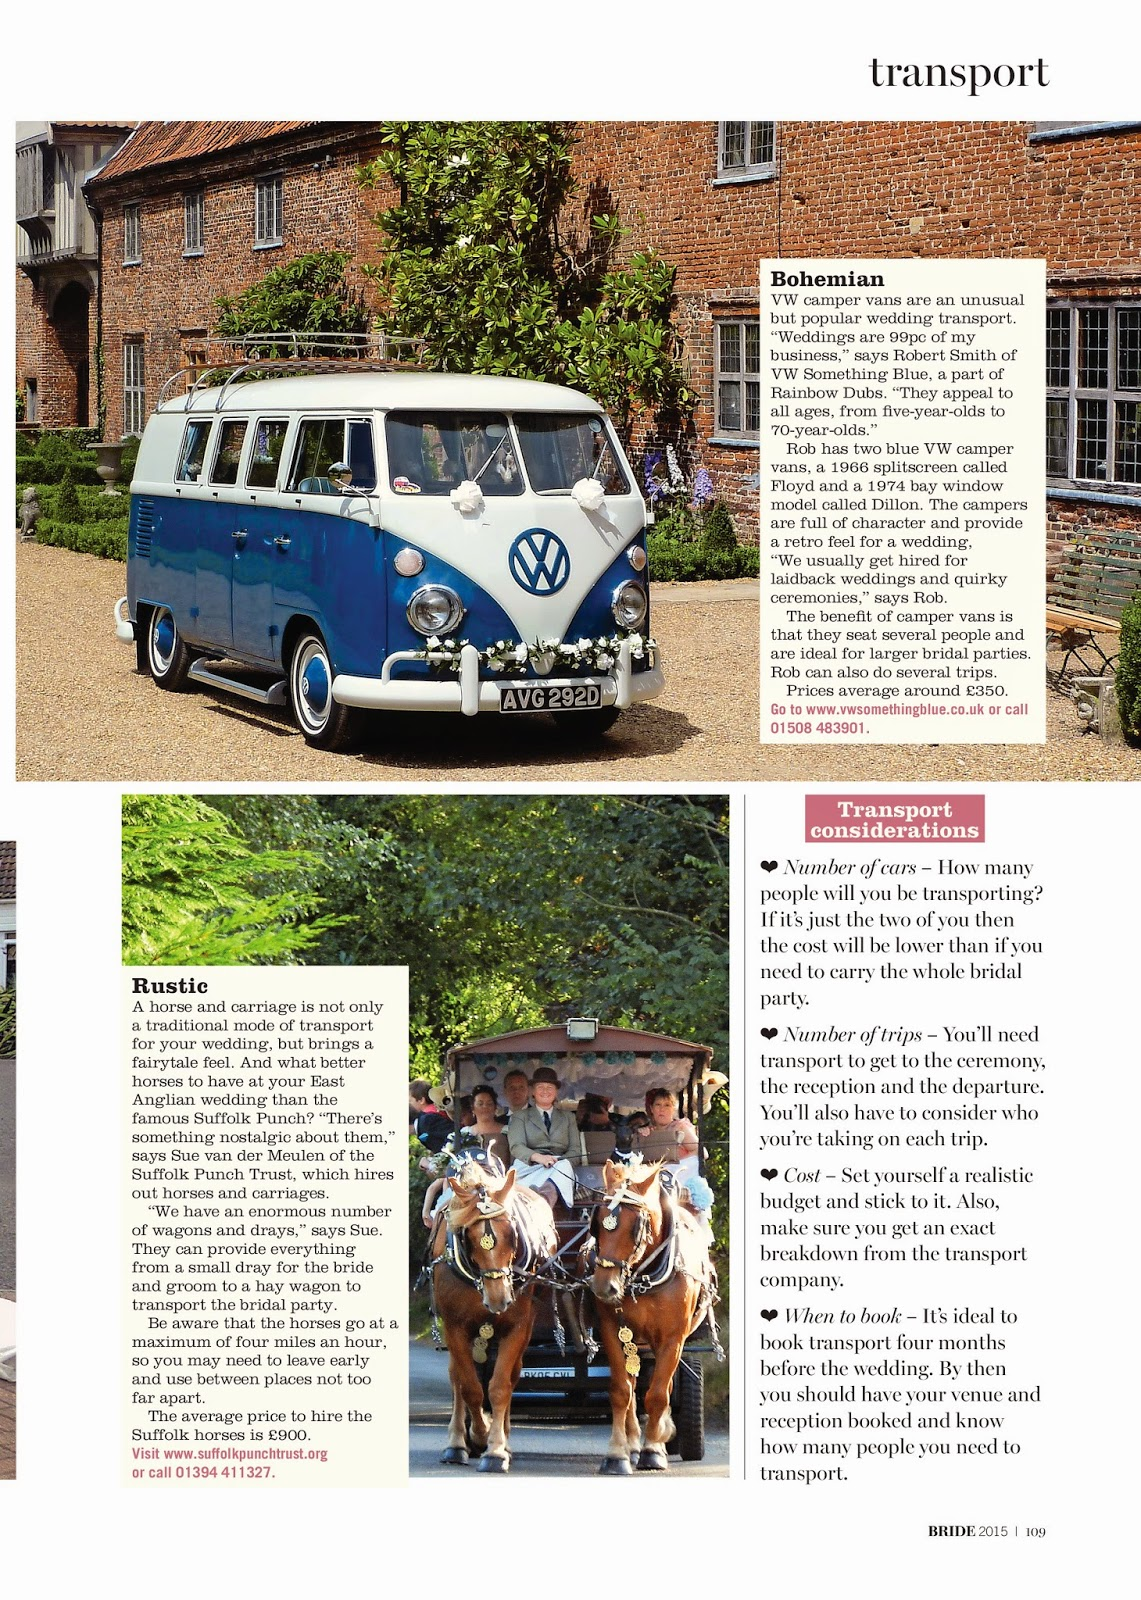 Wedding transport - Bride magazine